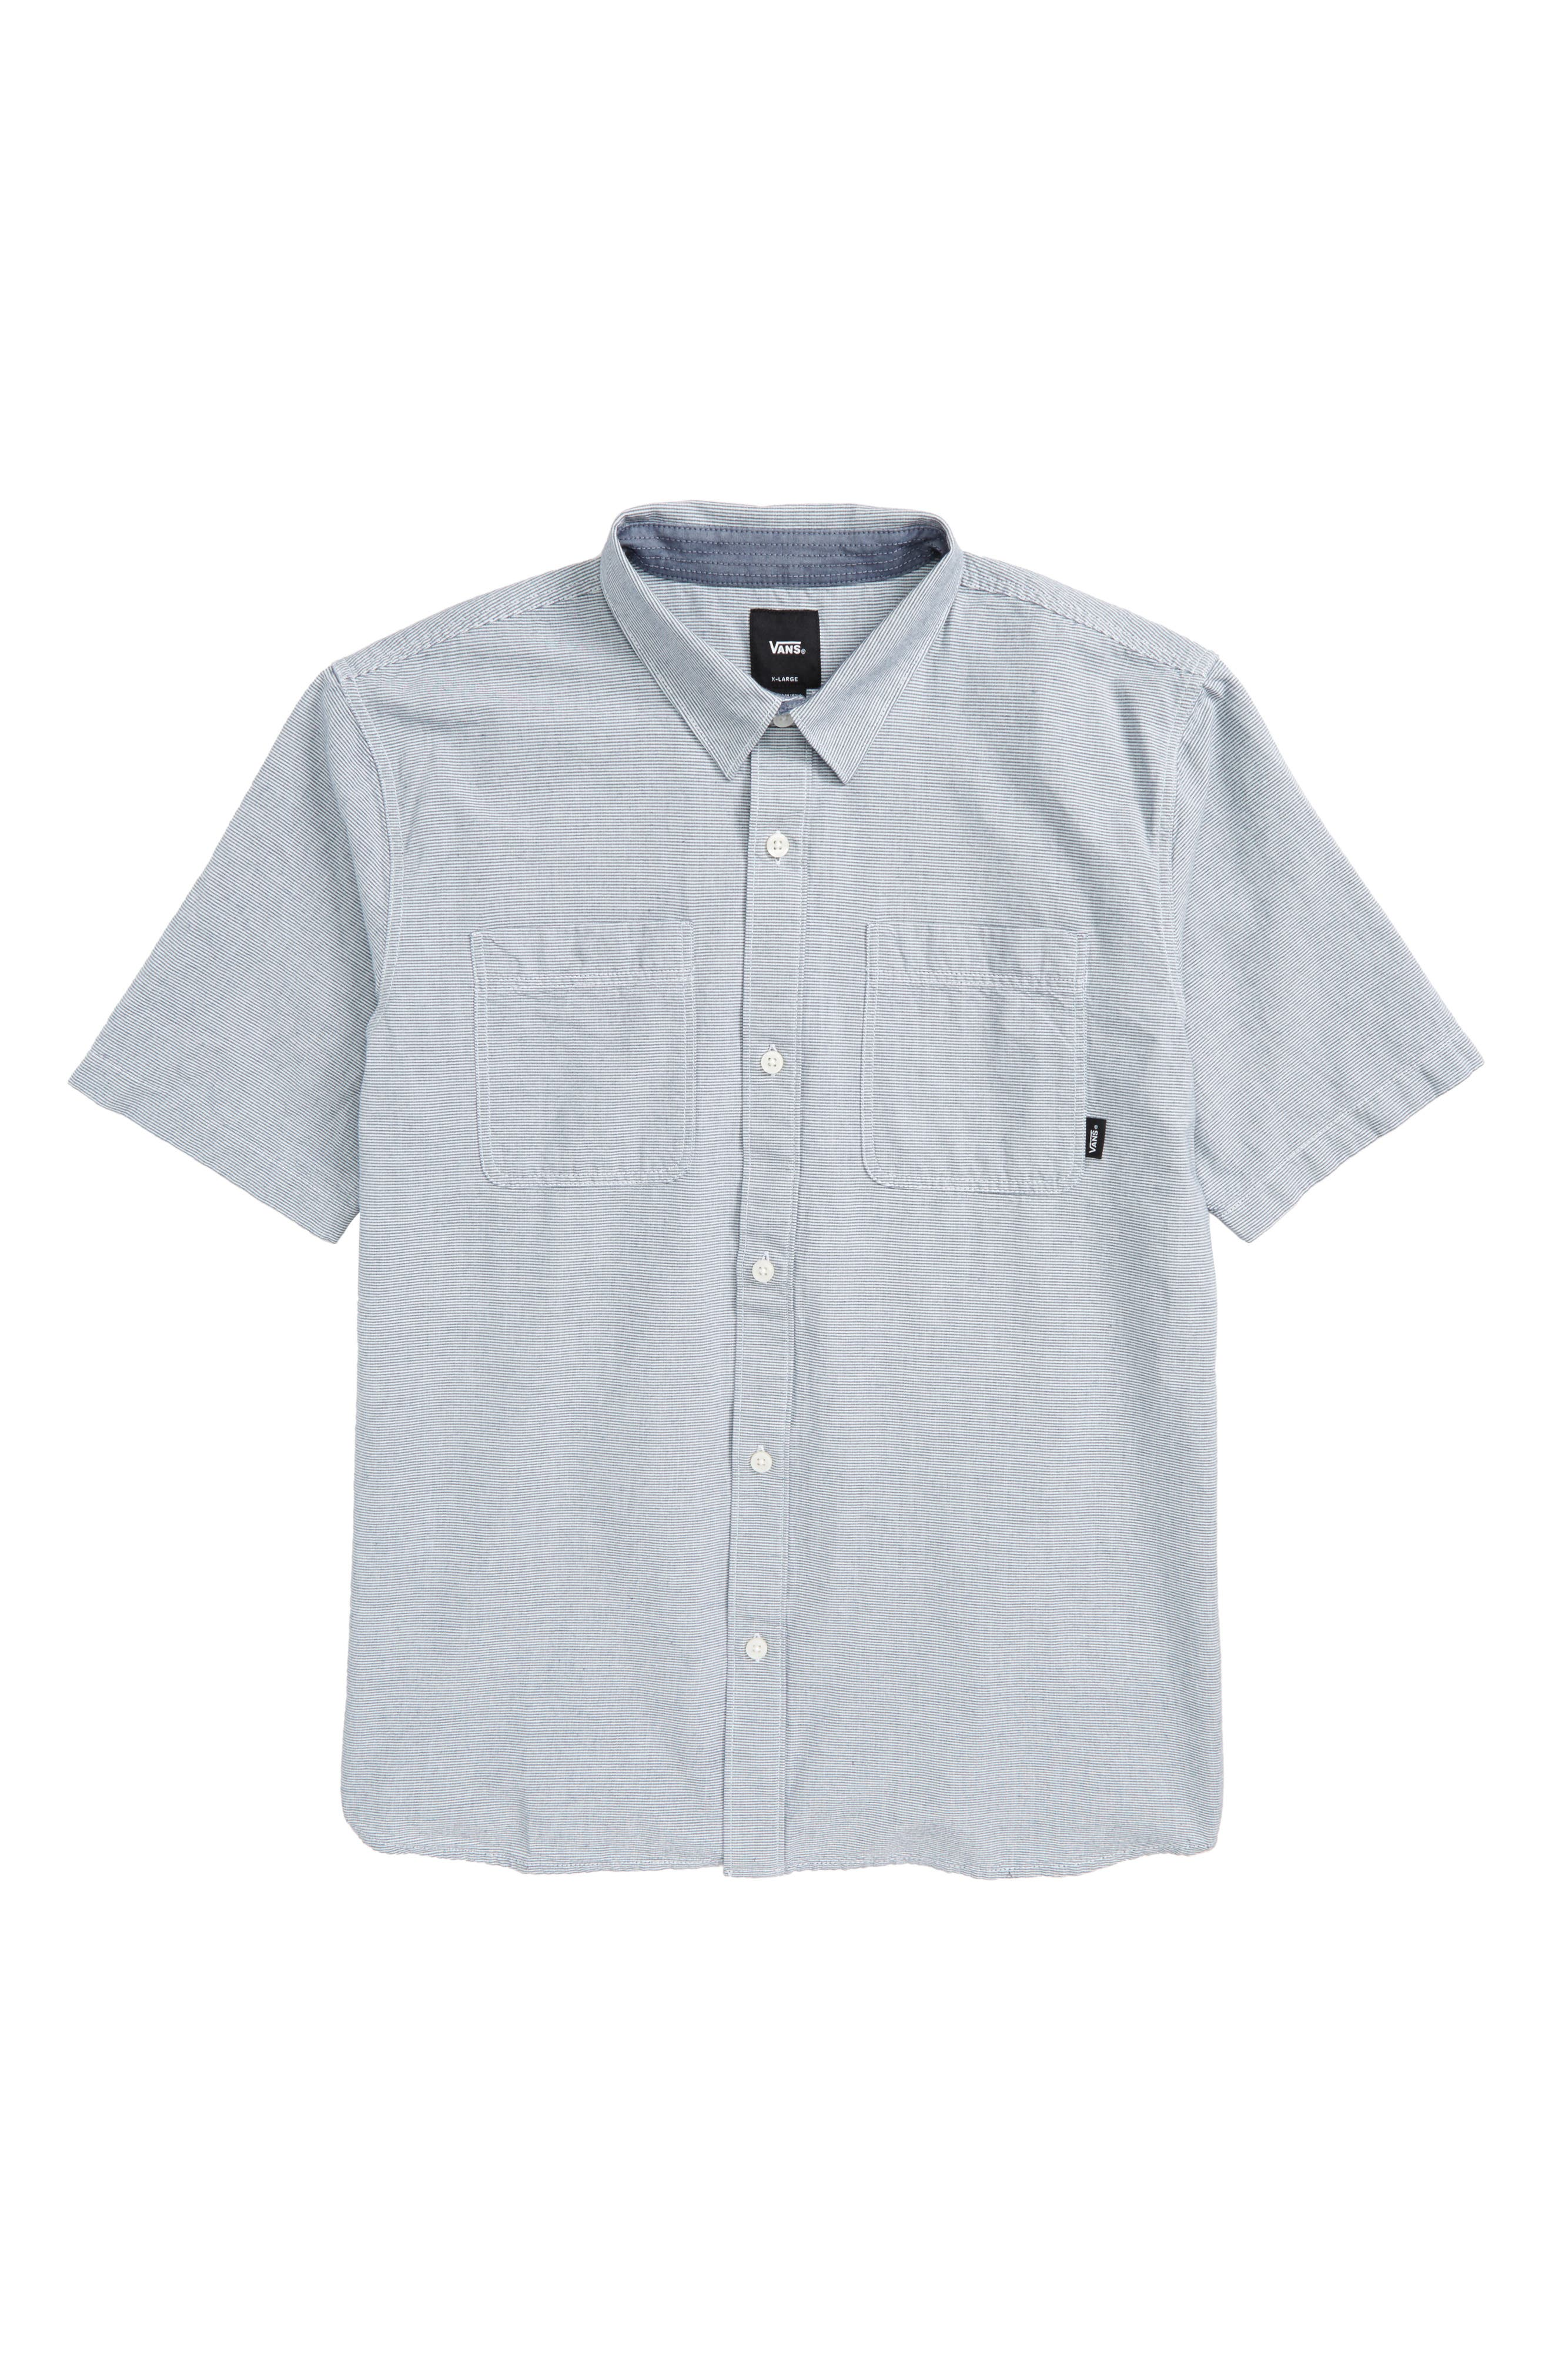 Wexford Woven Shirt,                             Main thumbnail 1, color,                             401